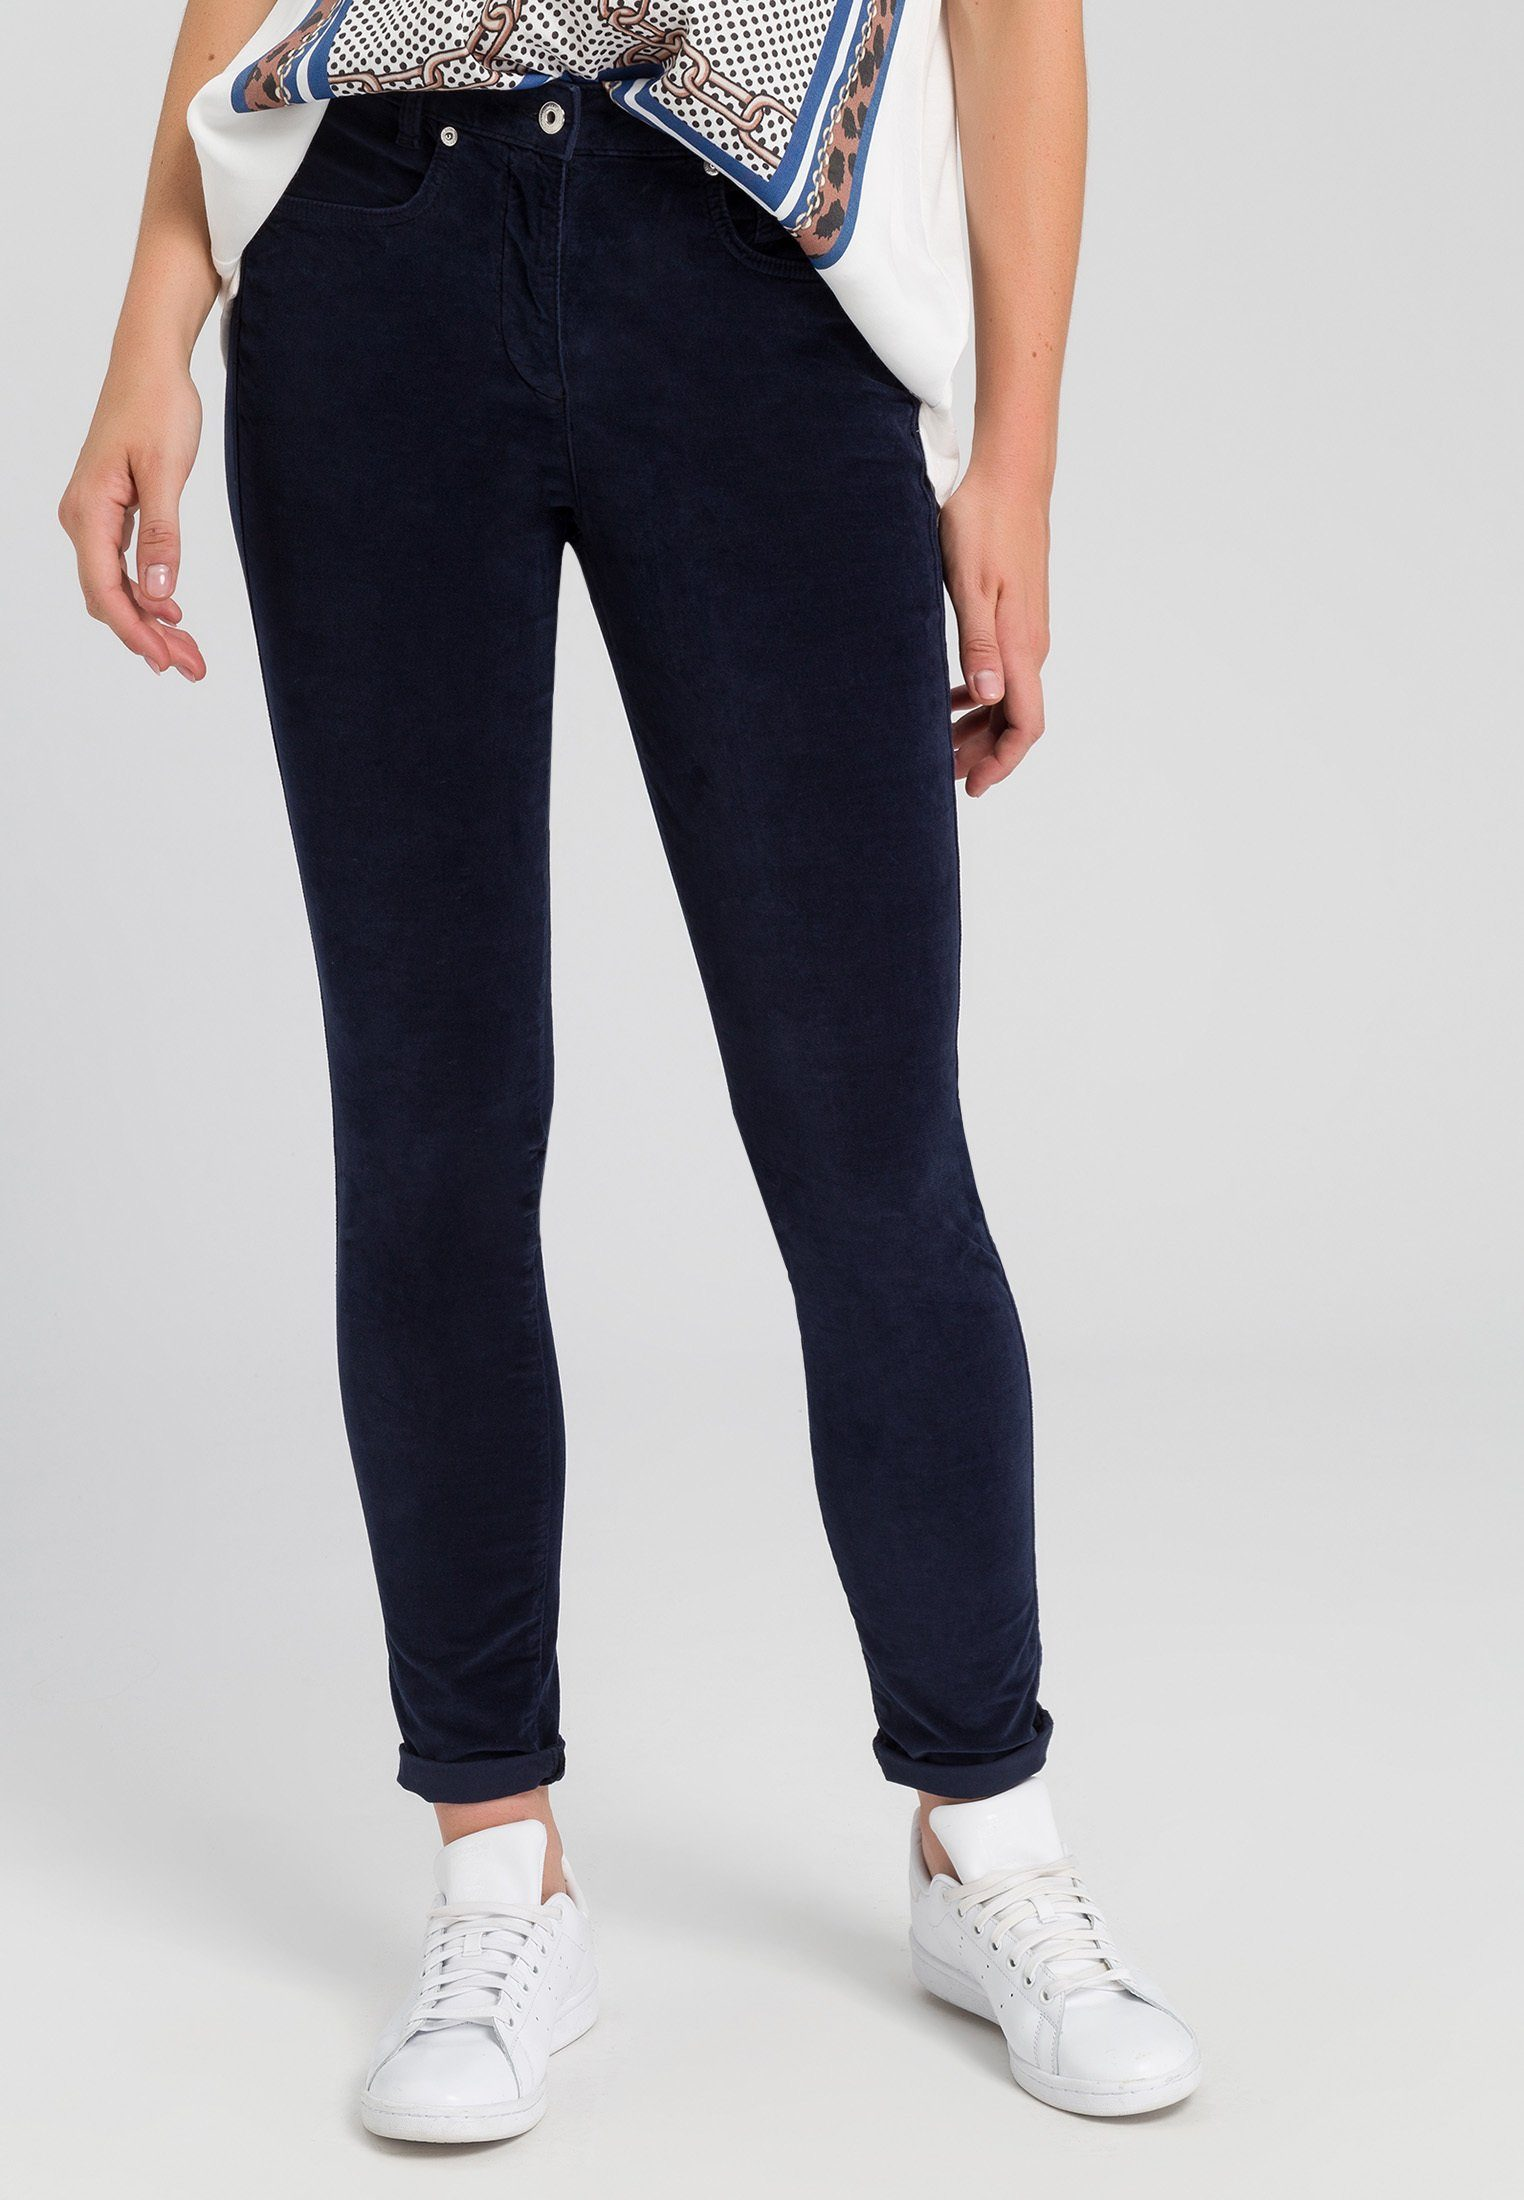 H.I.S ® Herren STRETCH Jeans Modell STANTON Randy W 31 32 33 34 36 38 40 42 NEU